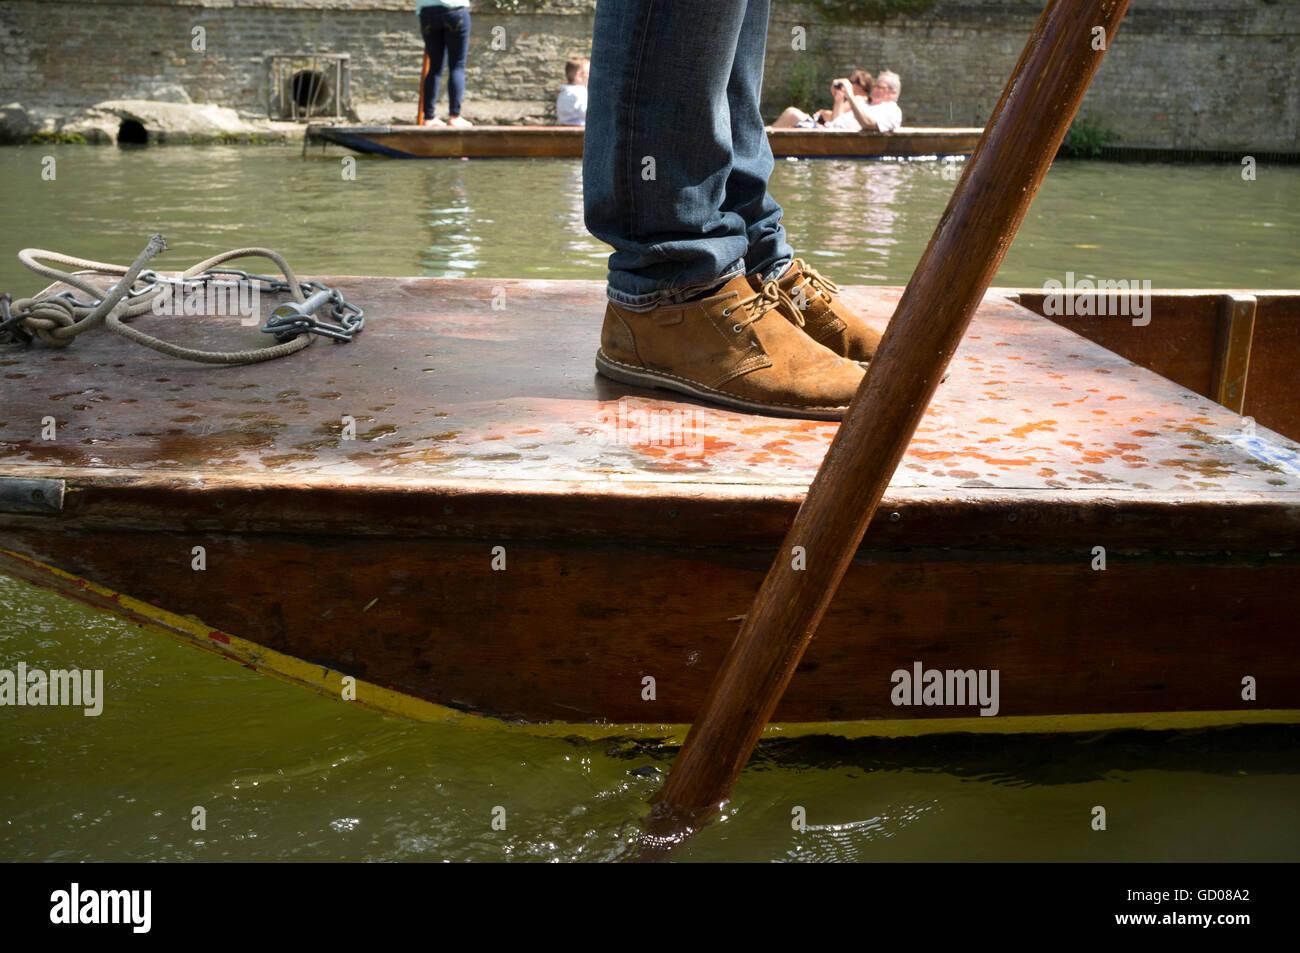 People enjoying punting on the River Cam, Cambridge - Stock Image